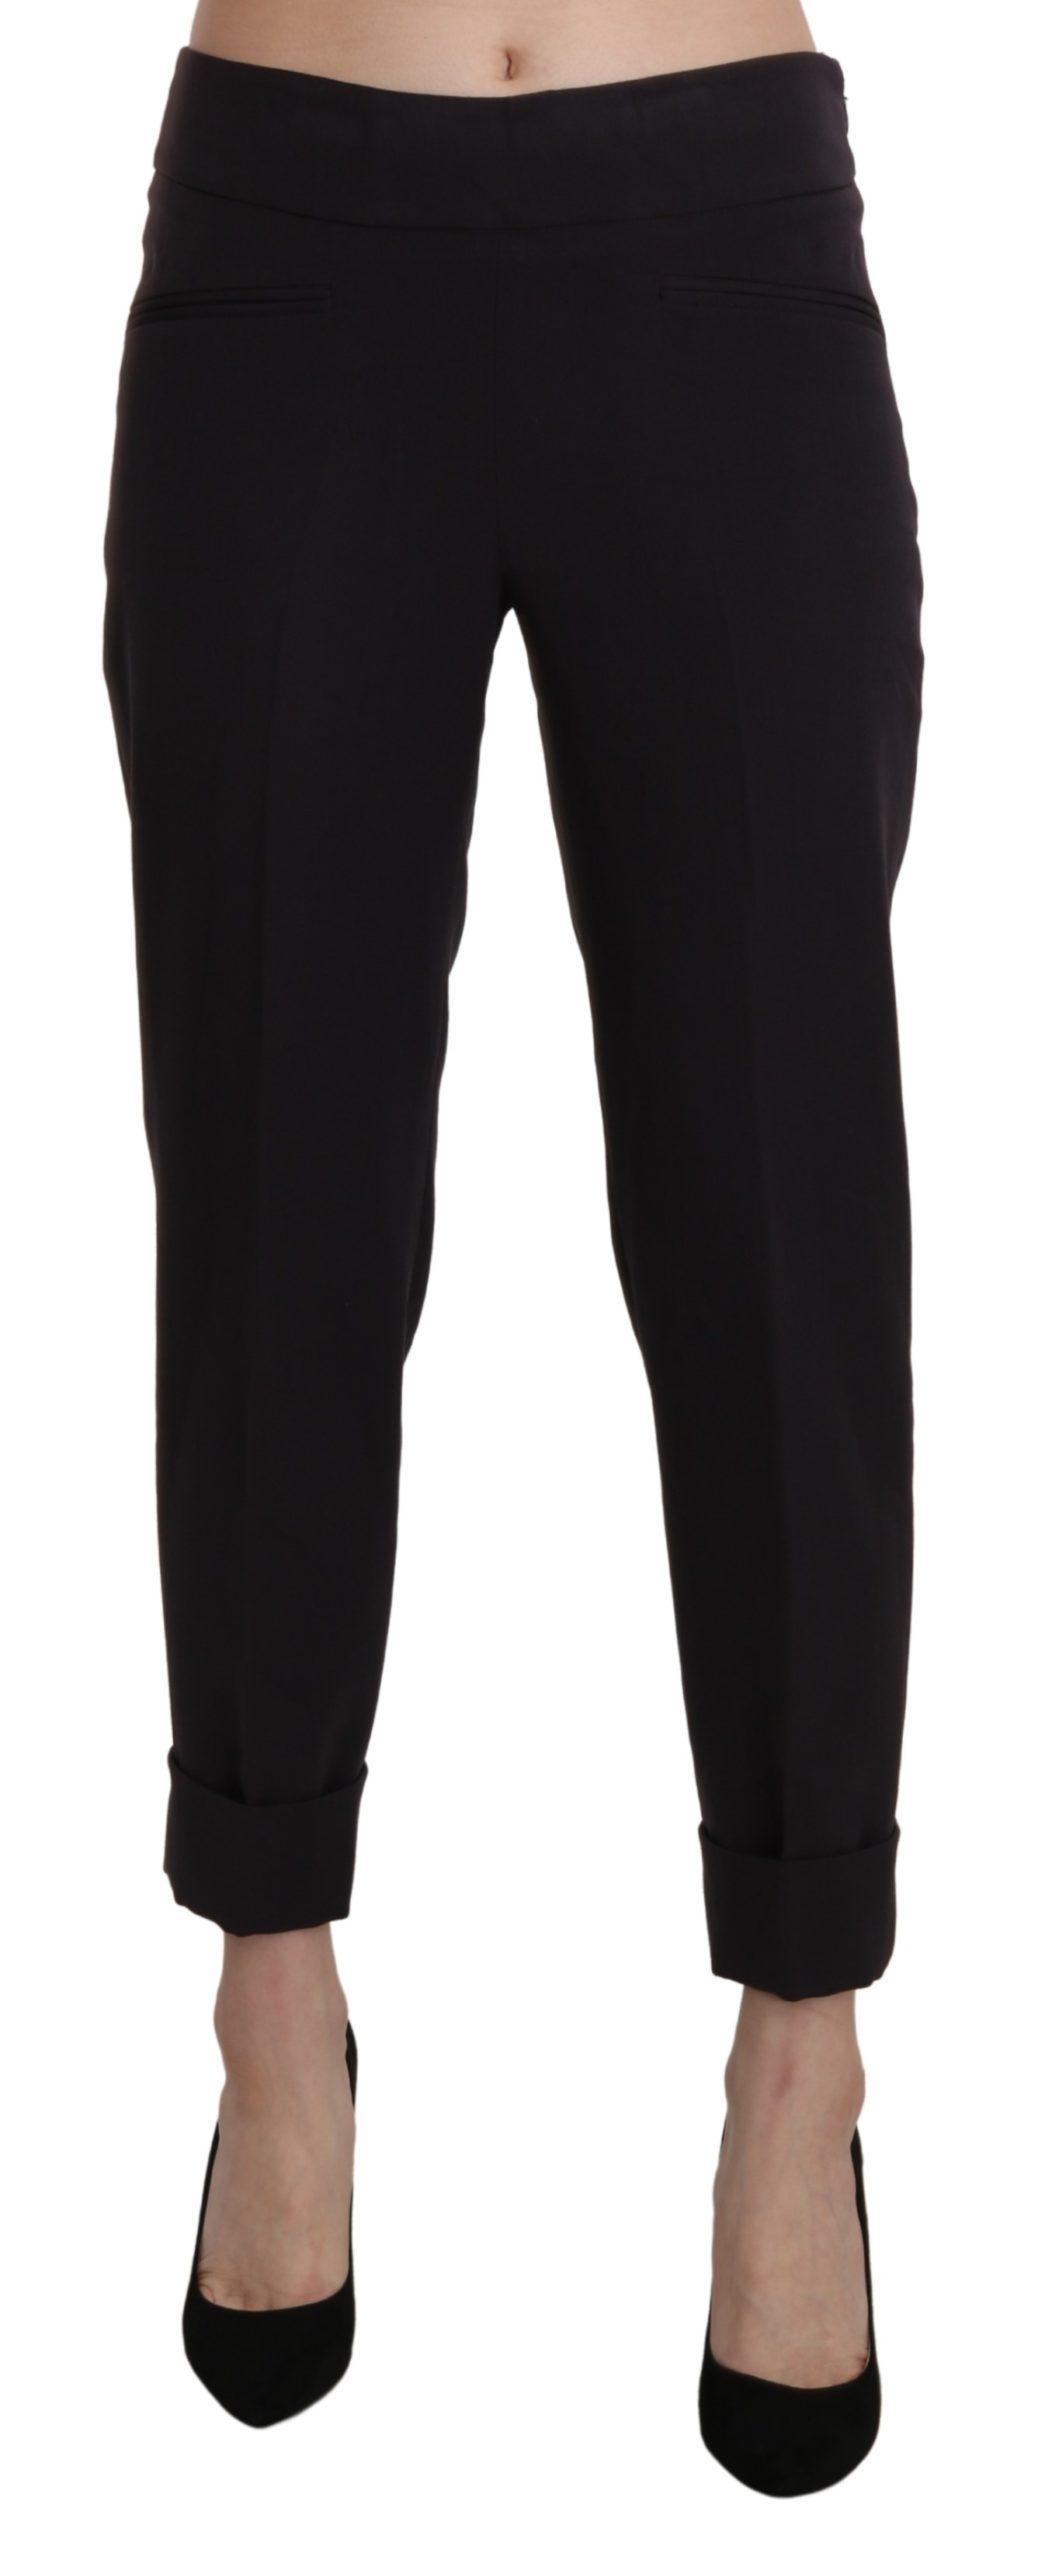 BENCIVENGA Women's Mid Waist Tapered Trousers Black PAN71367-42 - IT42|M